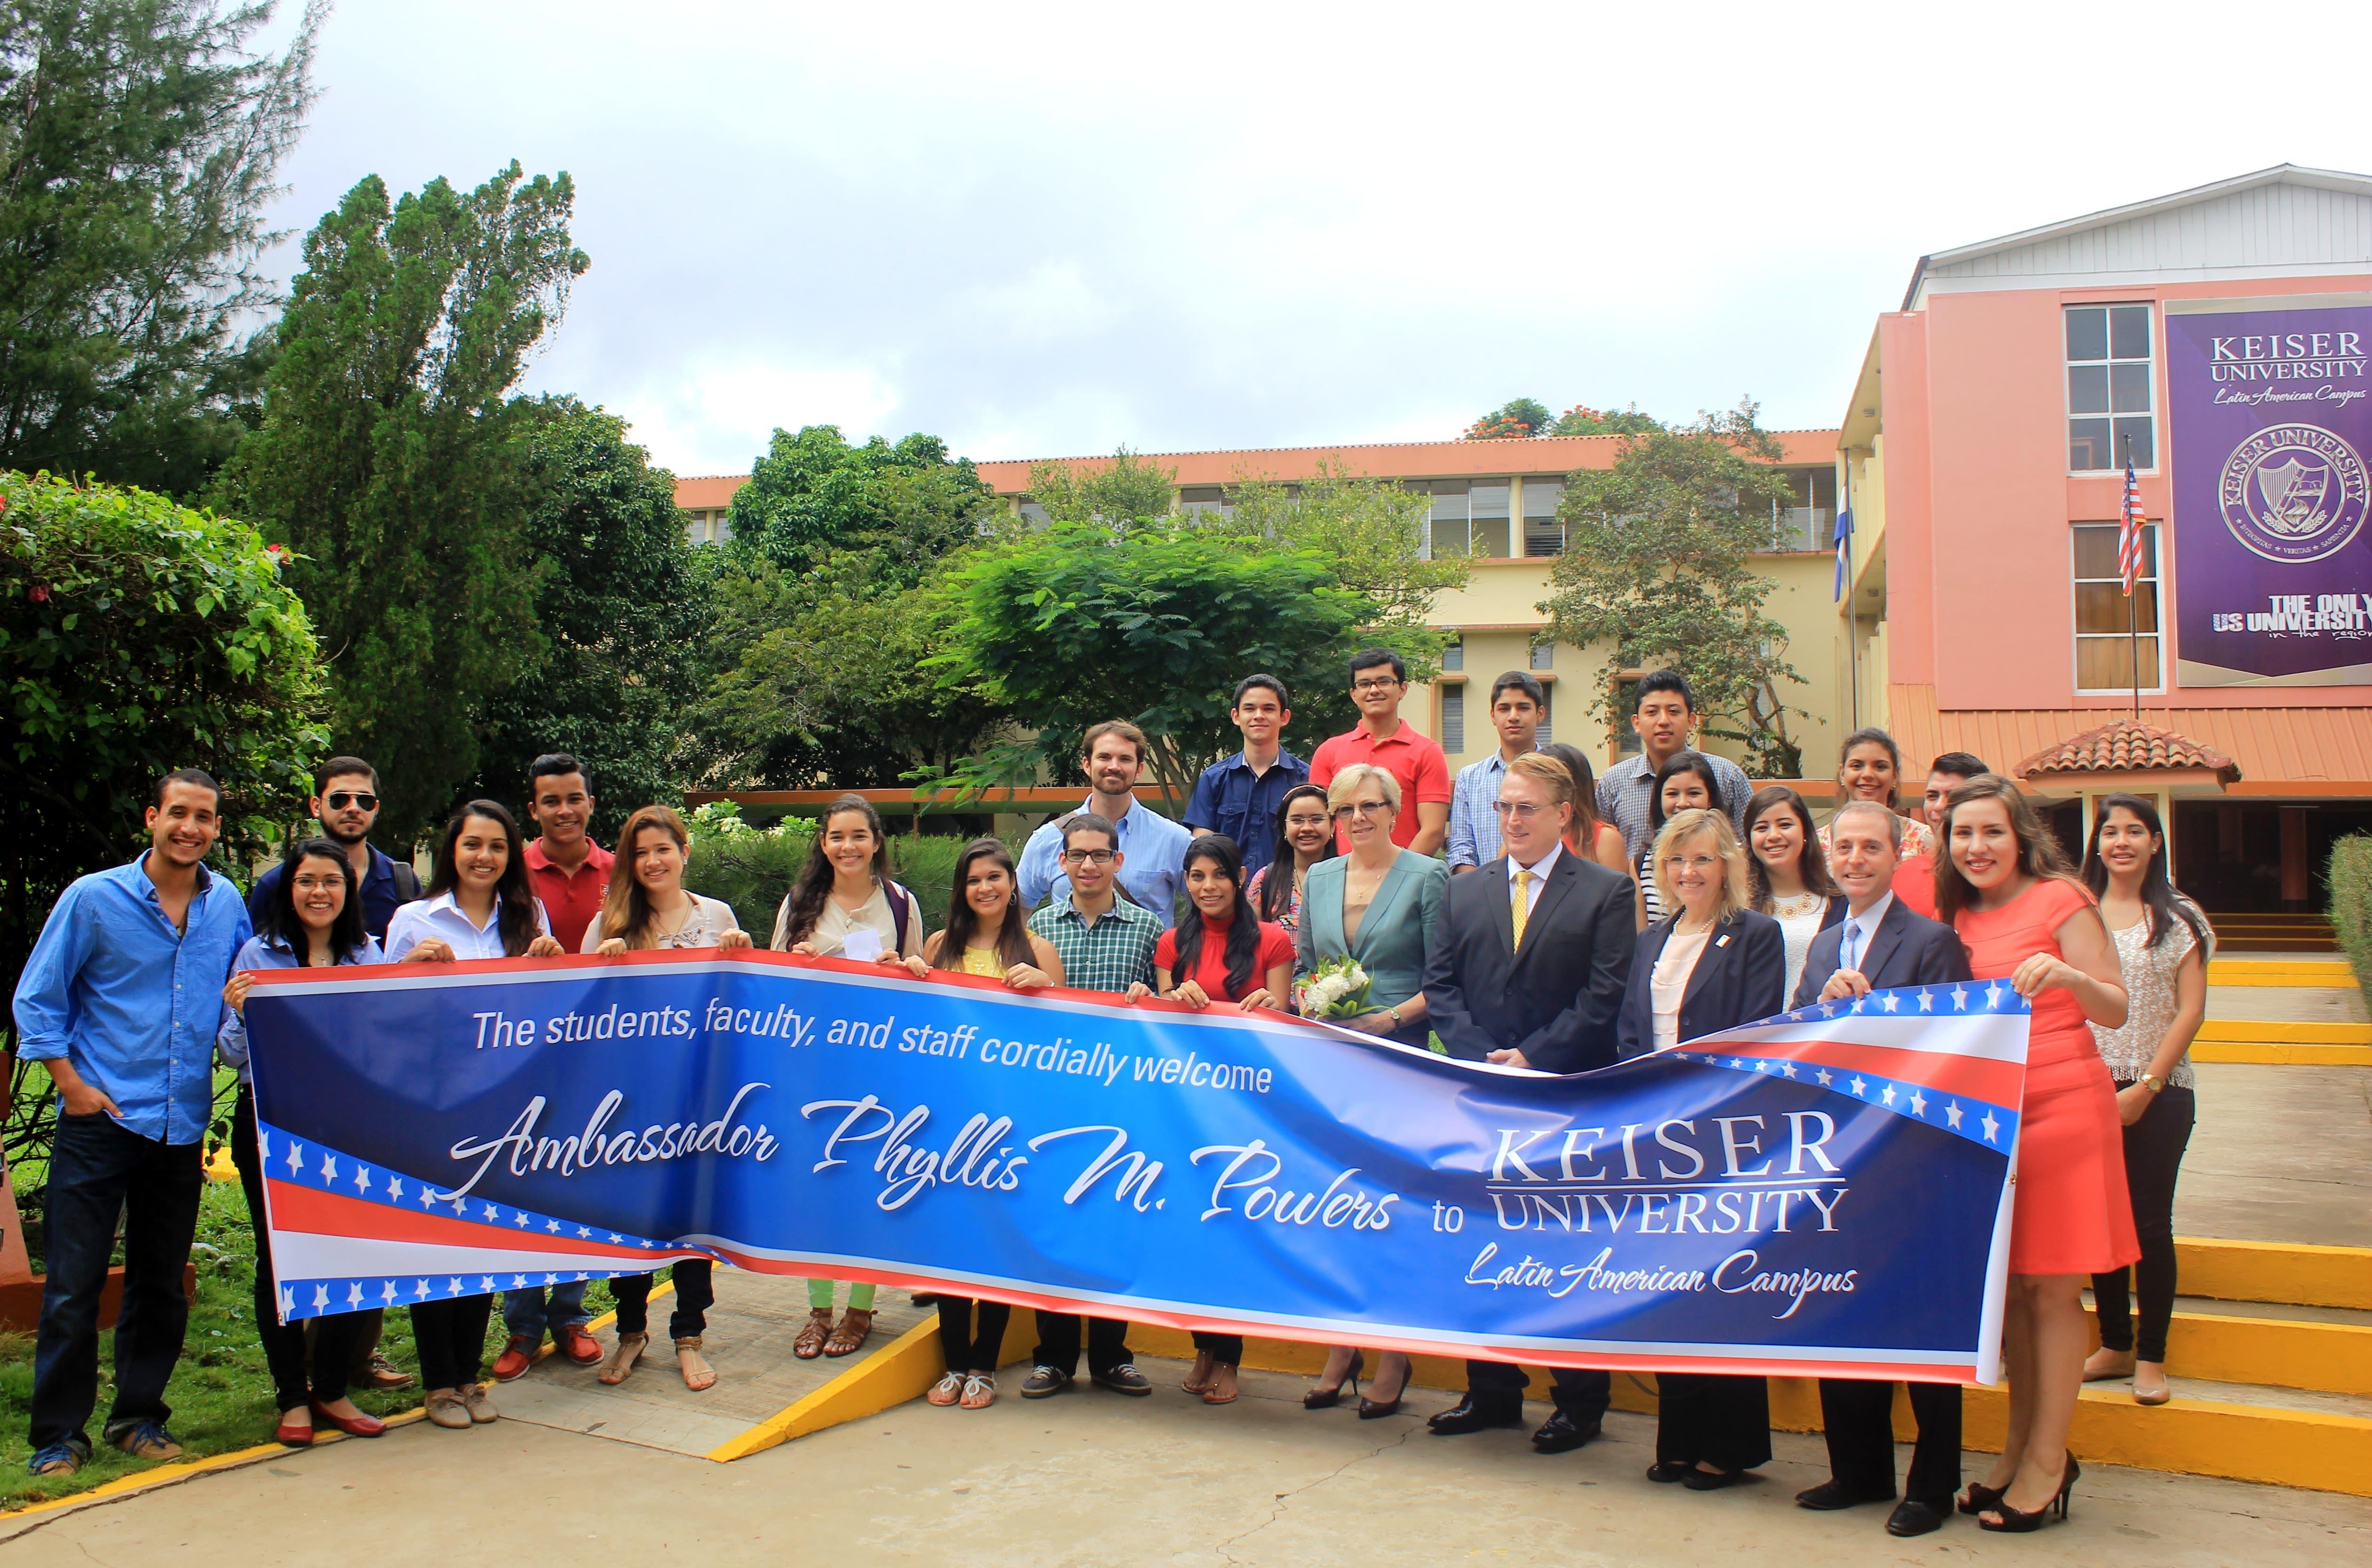 U.S. Ambassador to Nicaragua, Phyllis M. Powers, visits Keiser University's Latin American Campus